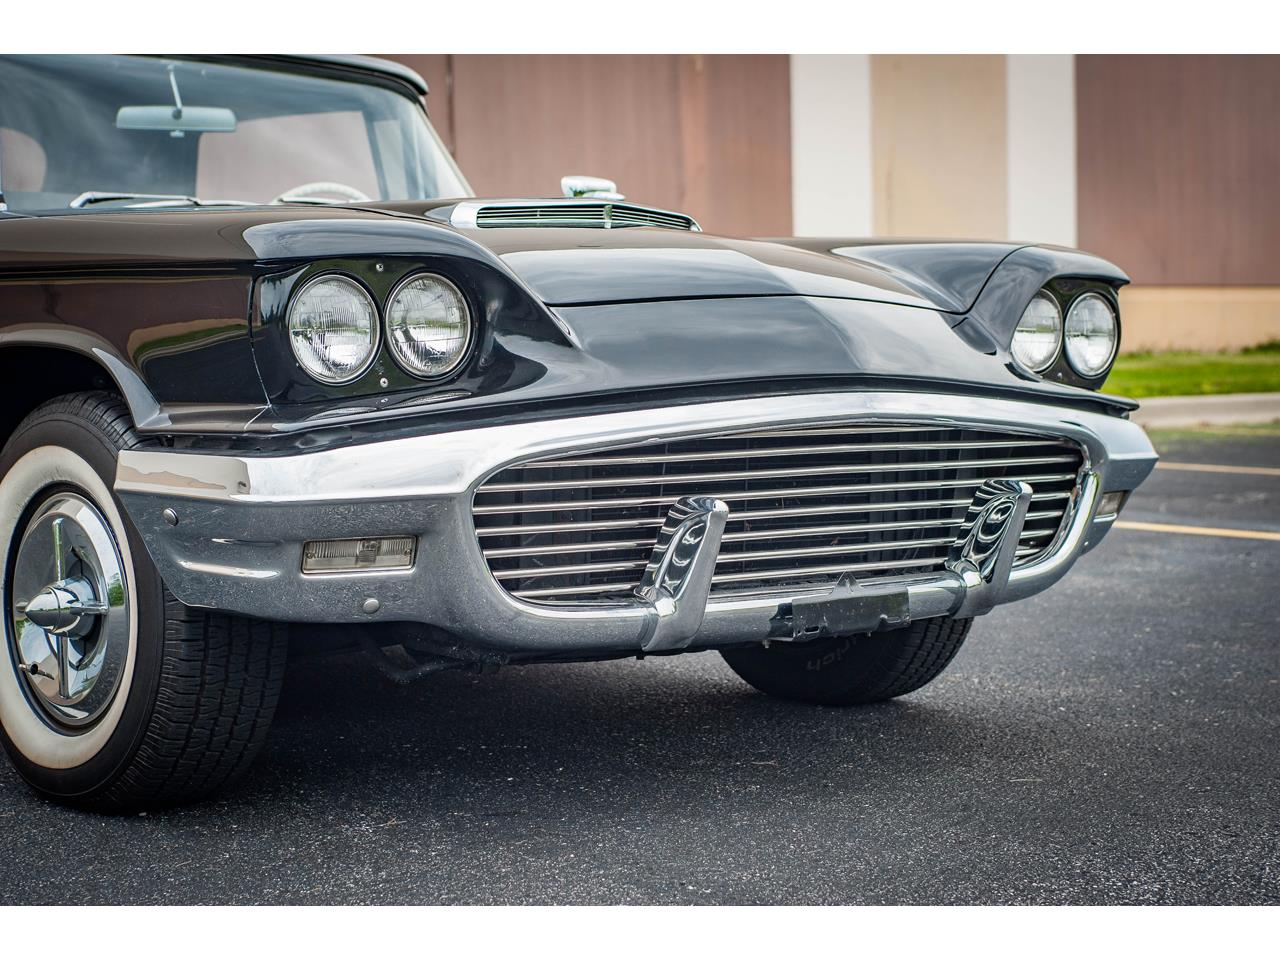 Large Picture of Classic 1960 Thunderbird located in O'Fallon Illinois - QB9W